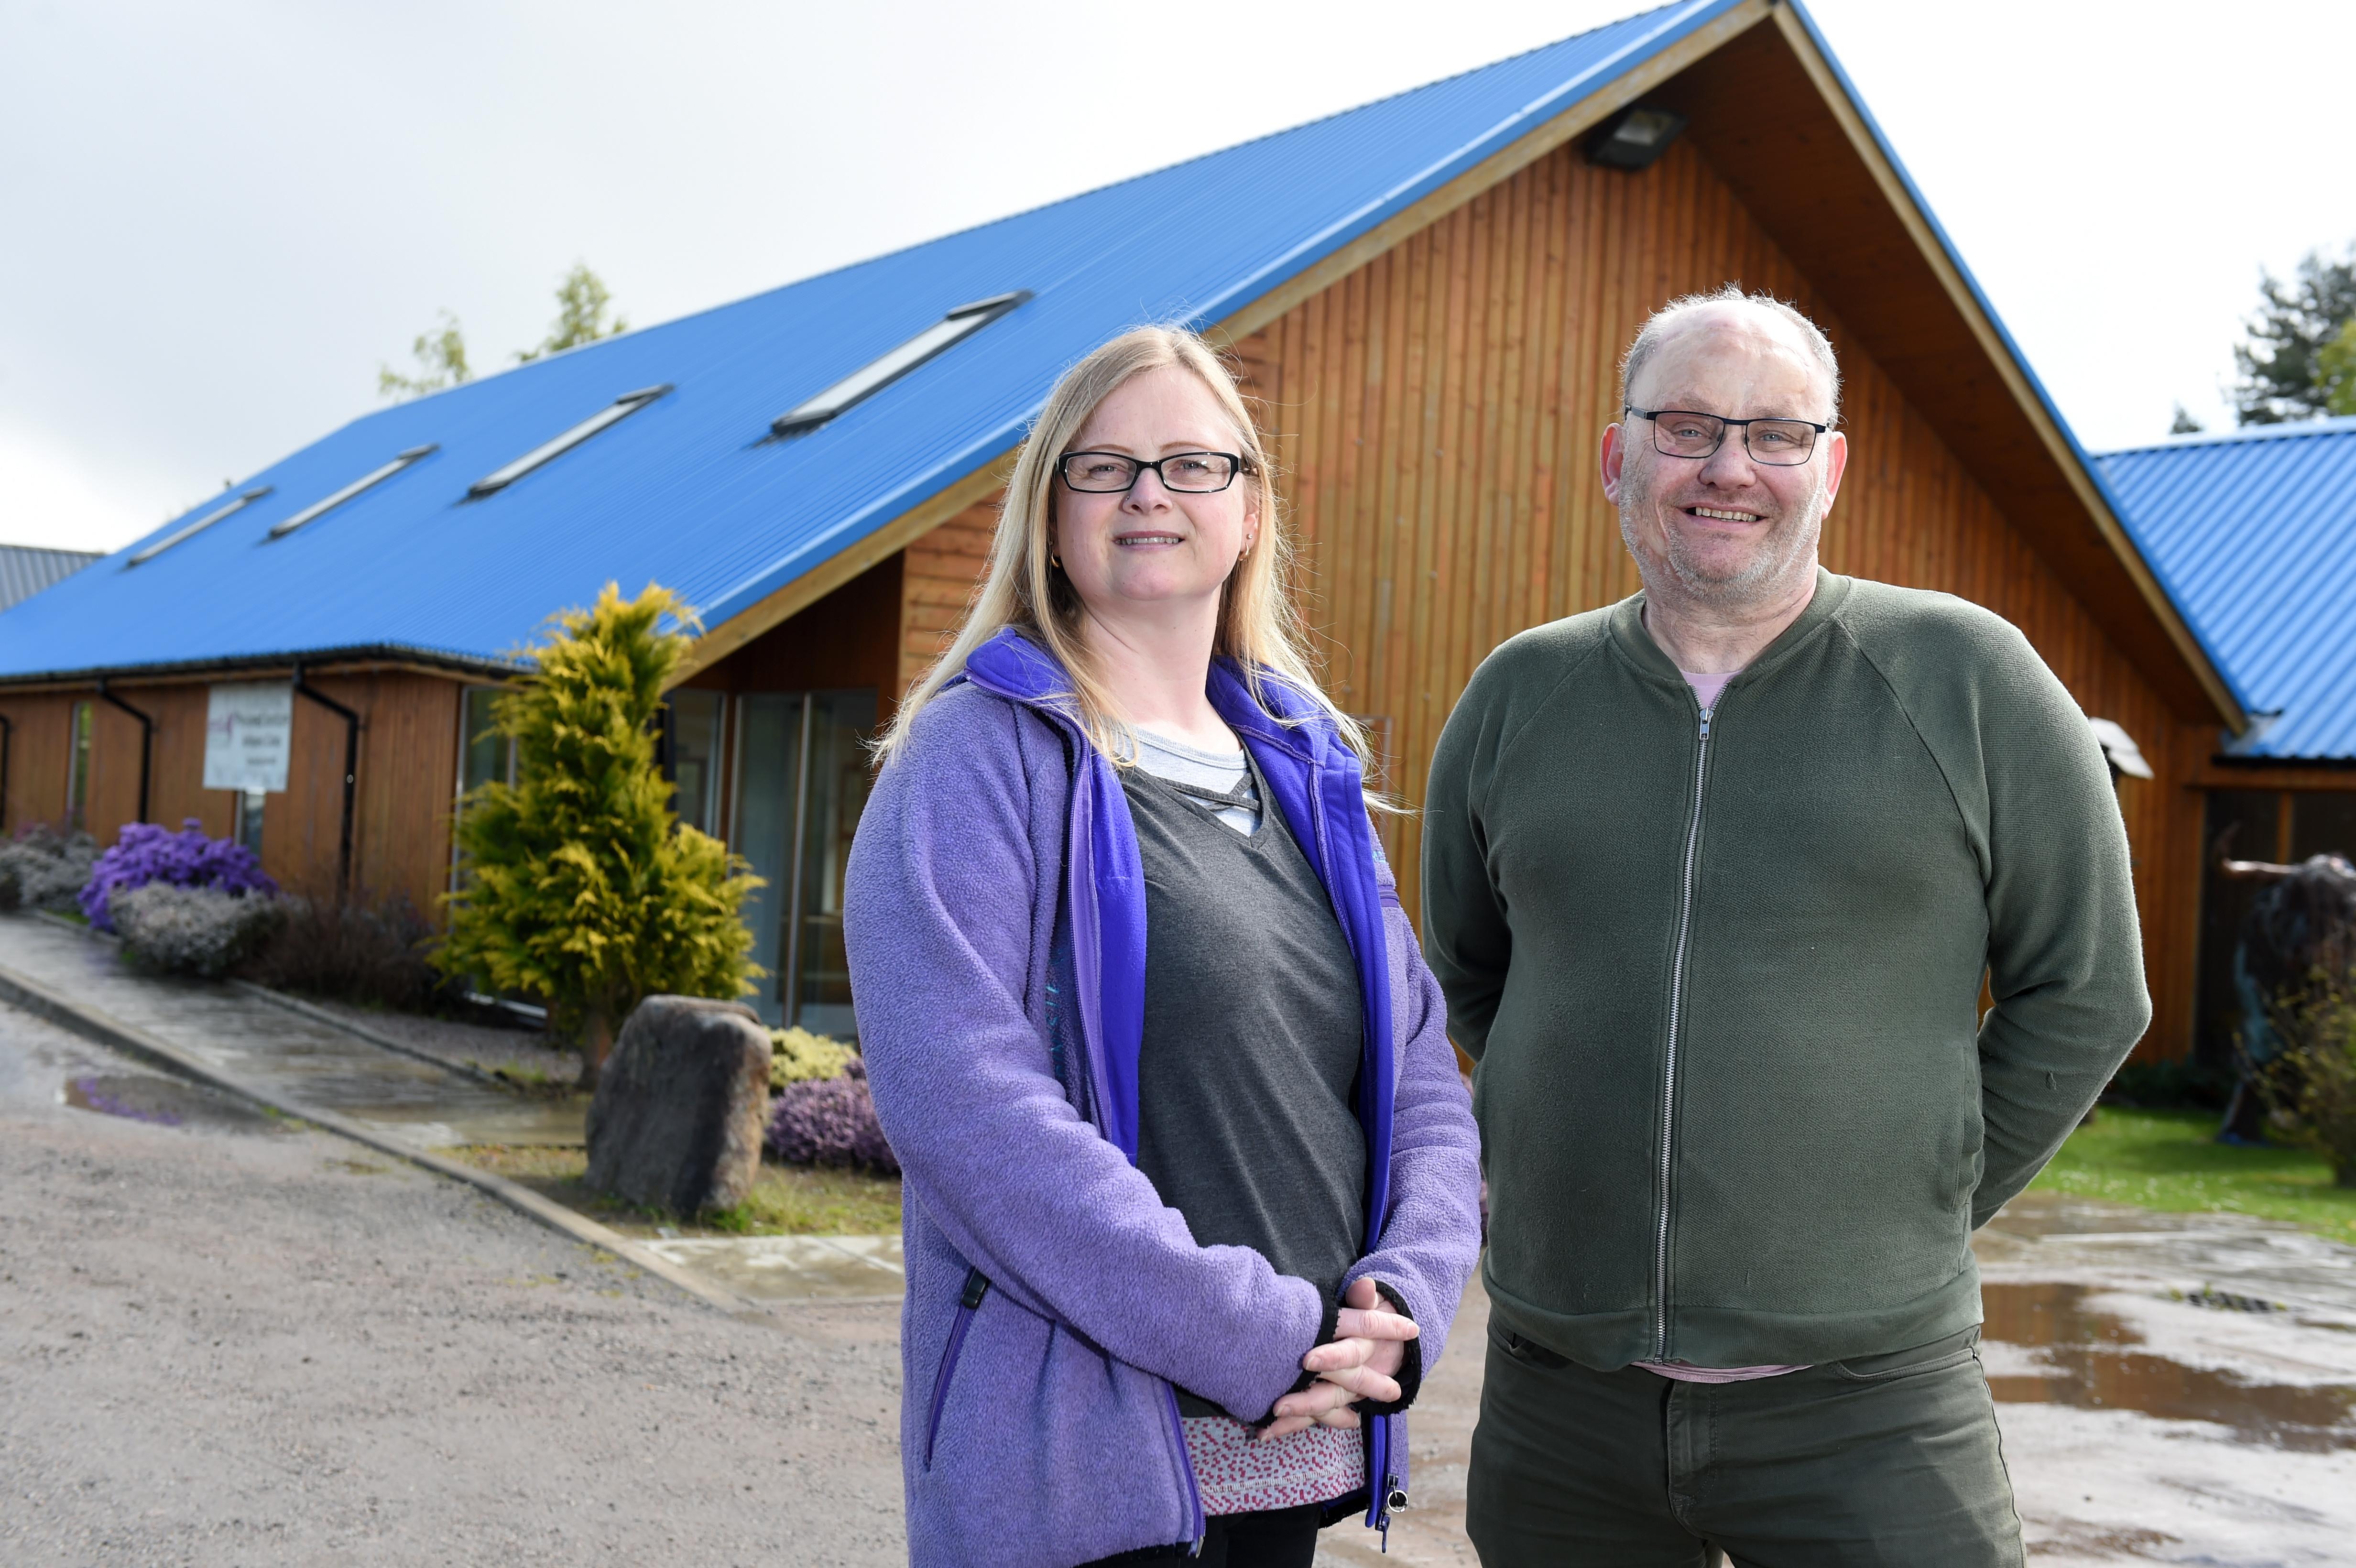 Angela Allan and Clive Hampshire of Smile Scotland